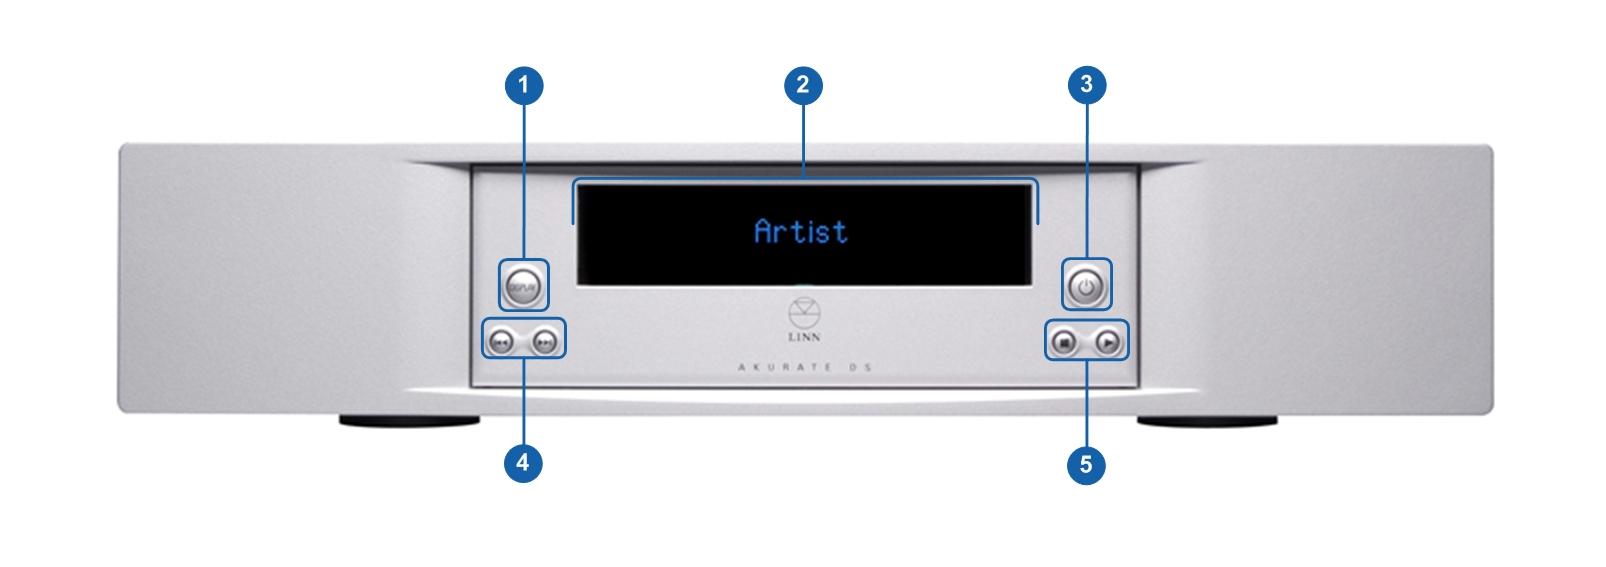 想買部network player - 影音領域 - 電腦領域 HKEPC Hardware